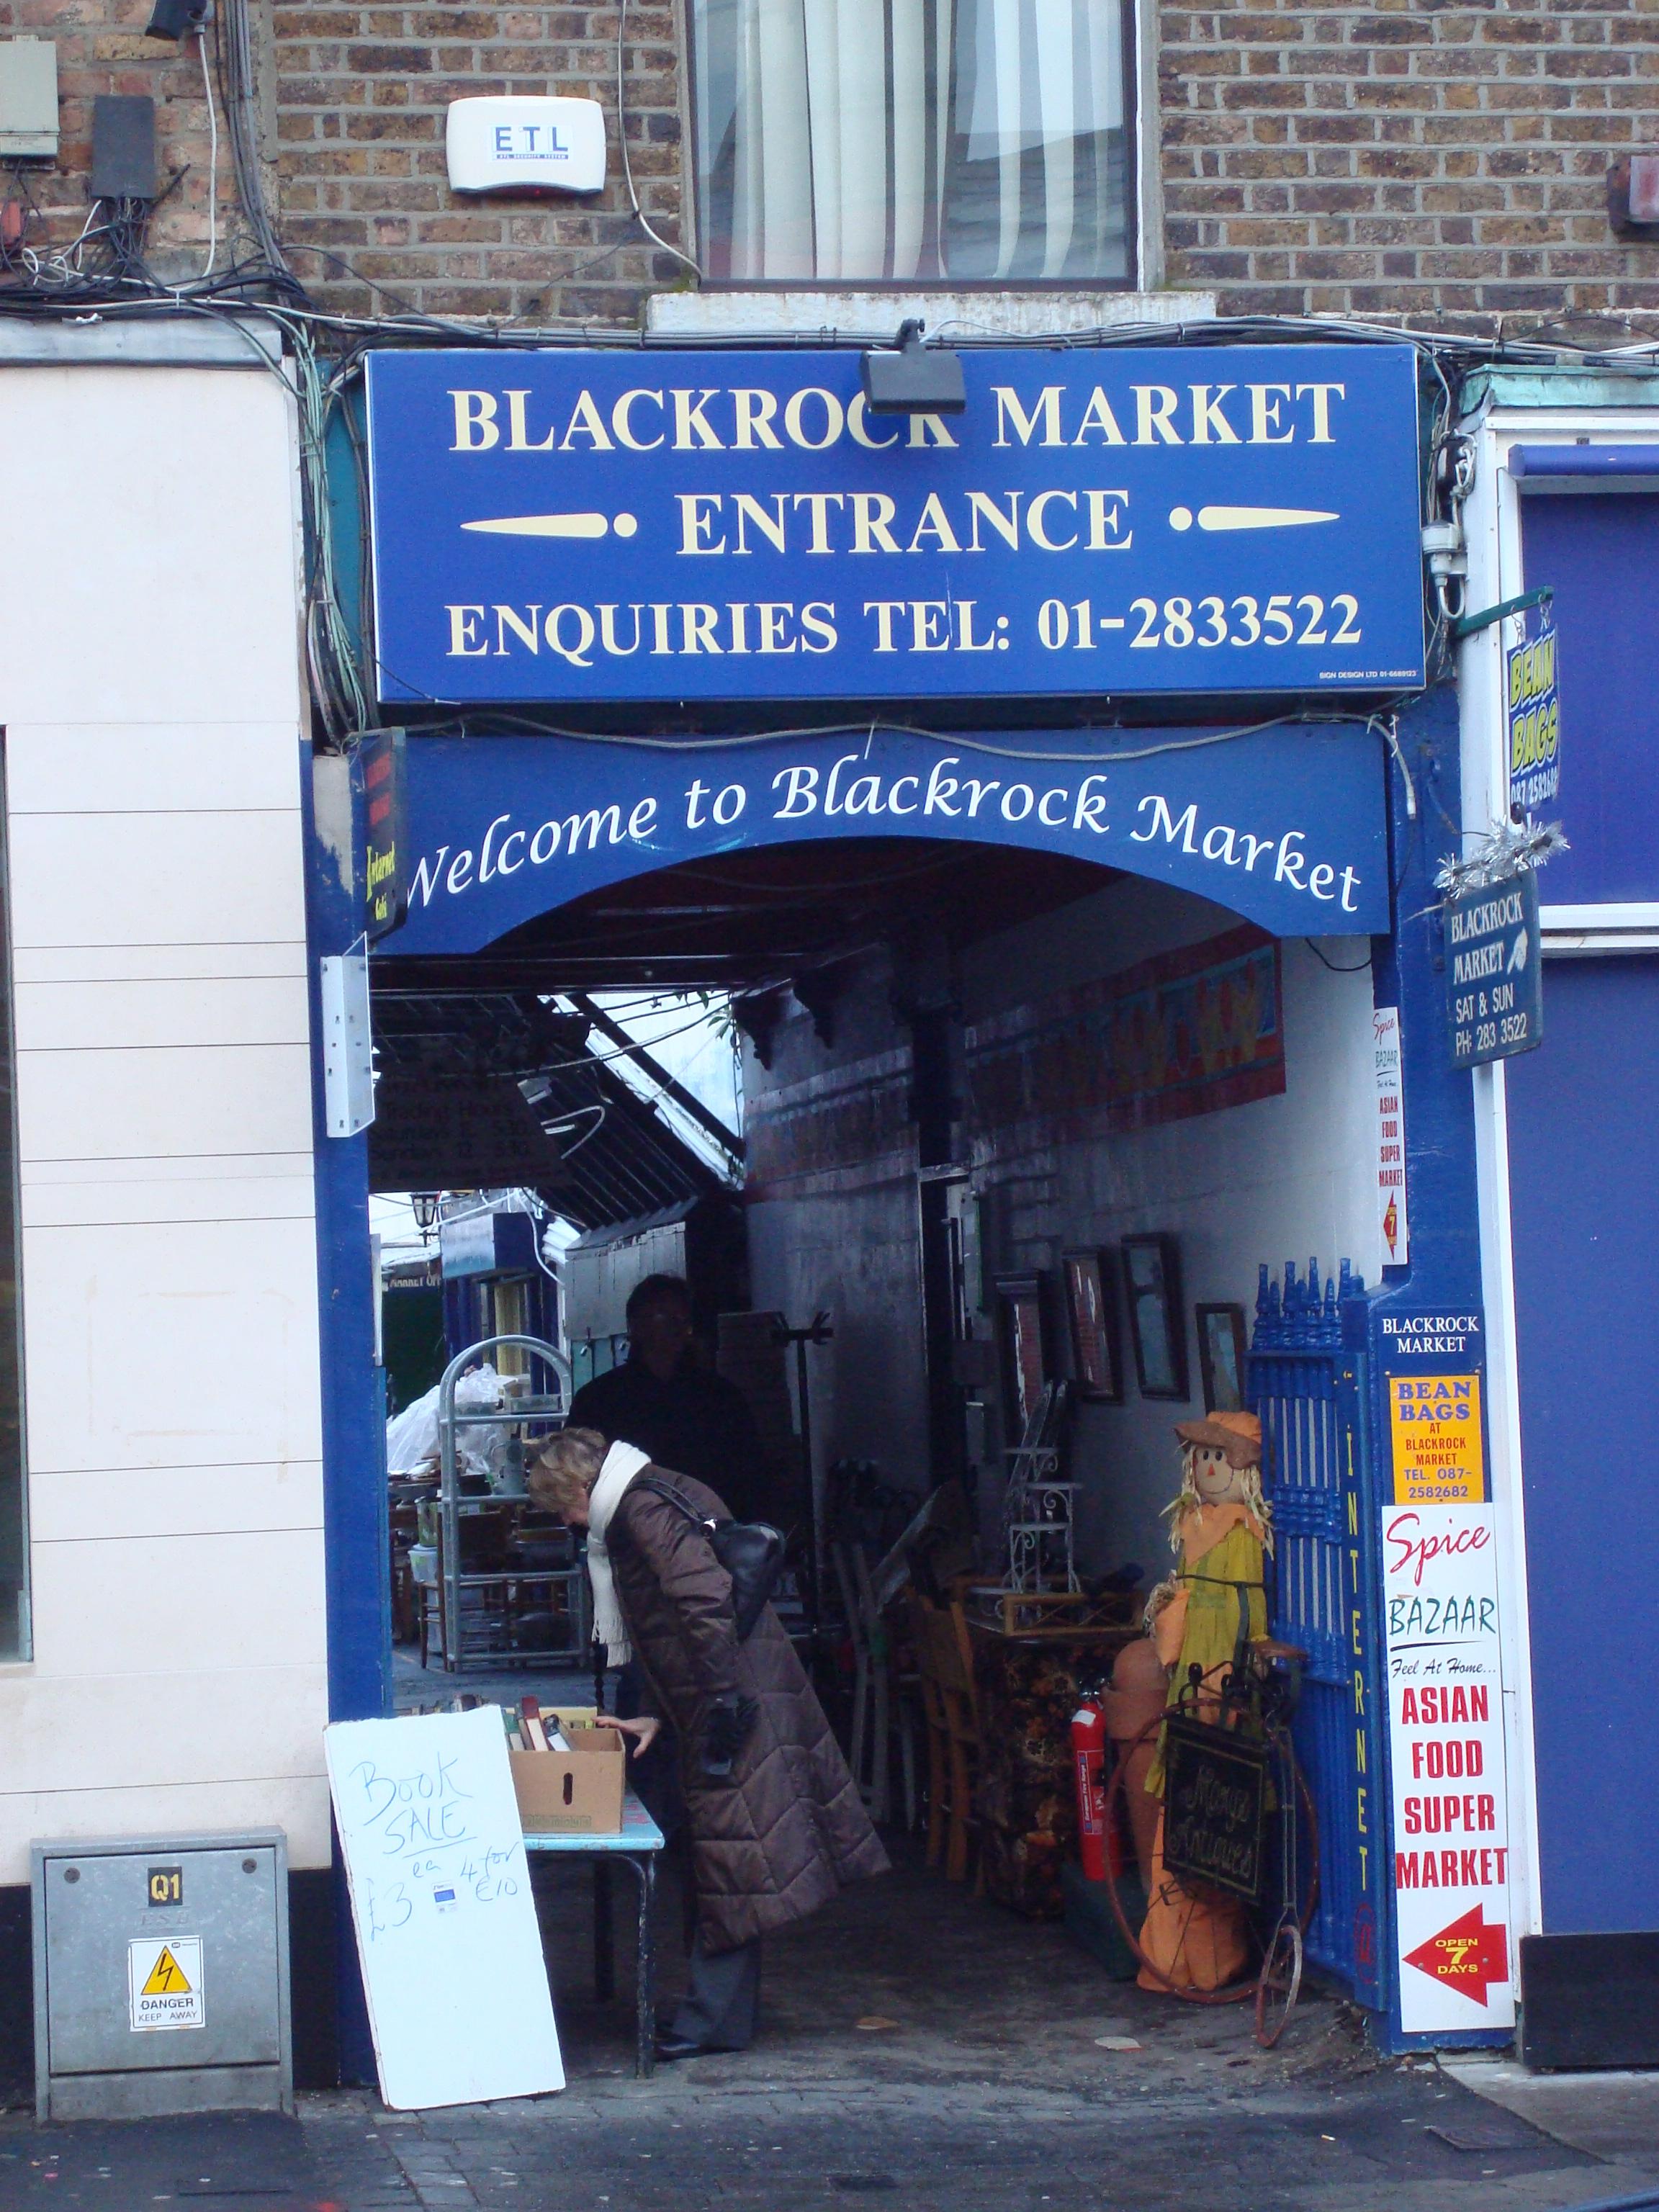 Blackrock Market entrance